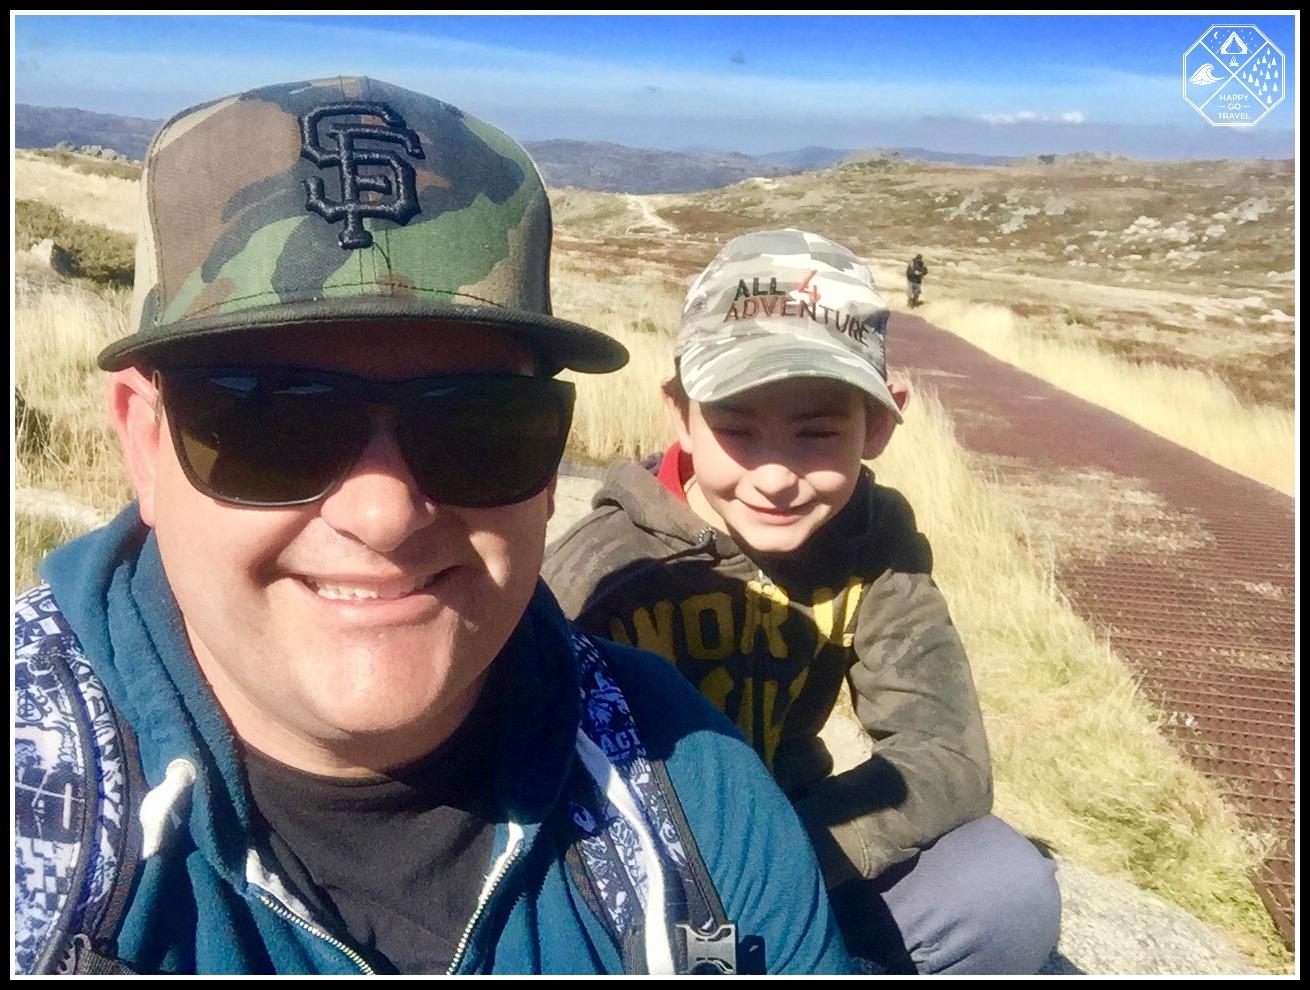 Hiking Mount Kosciuszko | father and son on the Mt Kosciuszko walkway